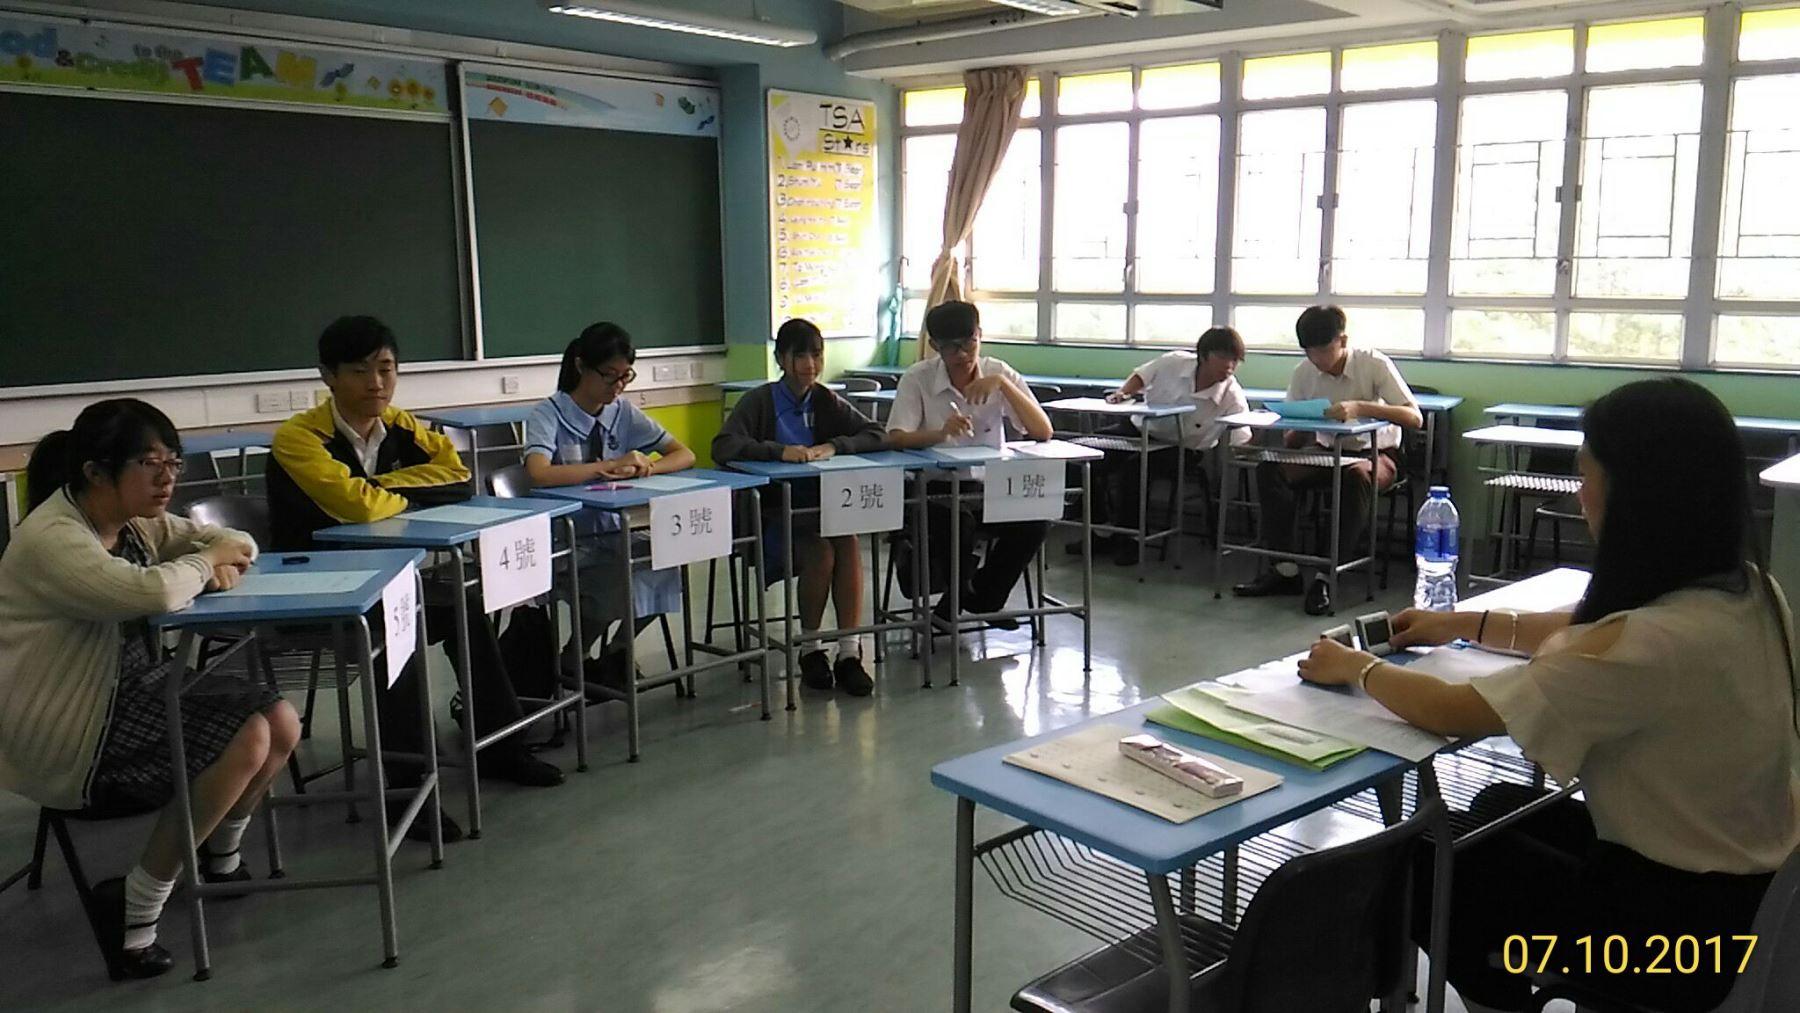 http://npc.edu.hk/sites/default/files/p_20171007_094957_1_p.jpg